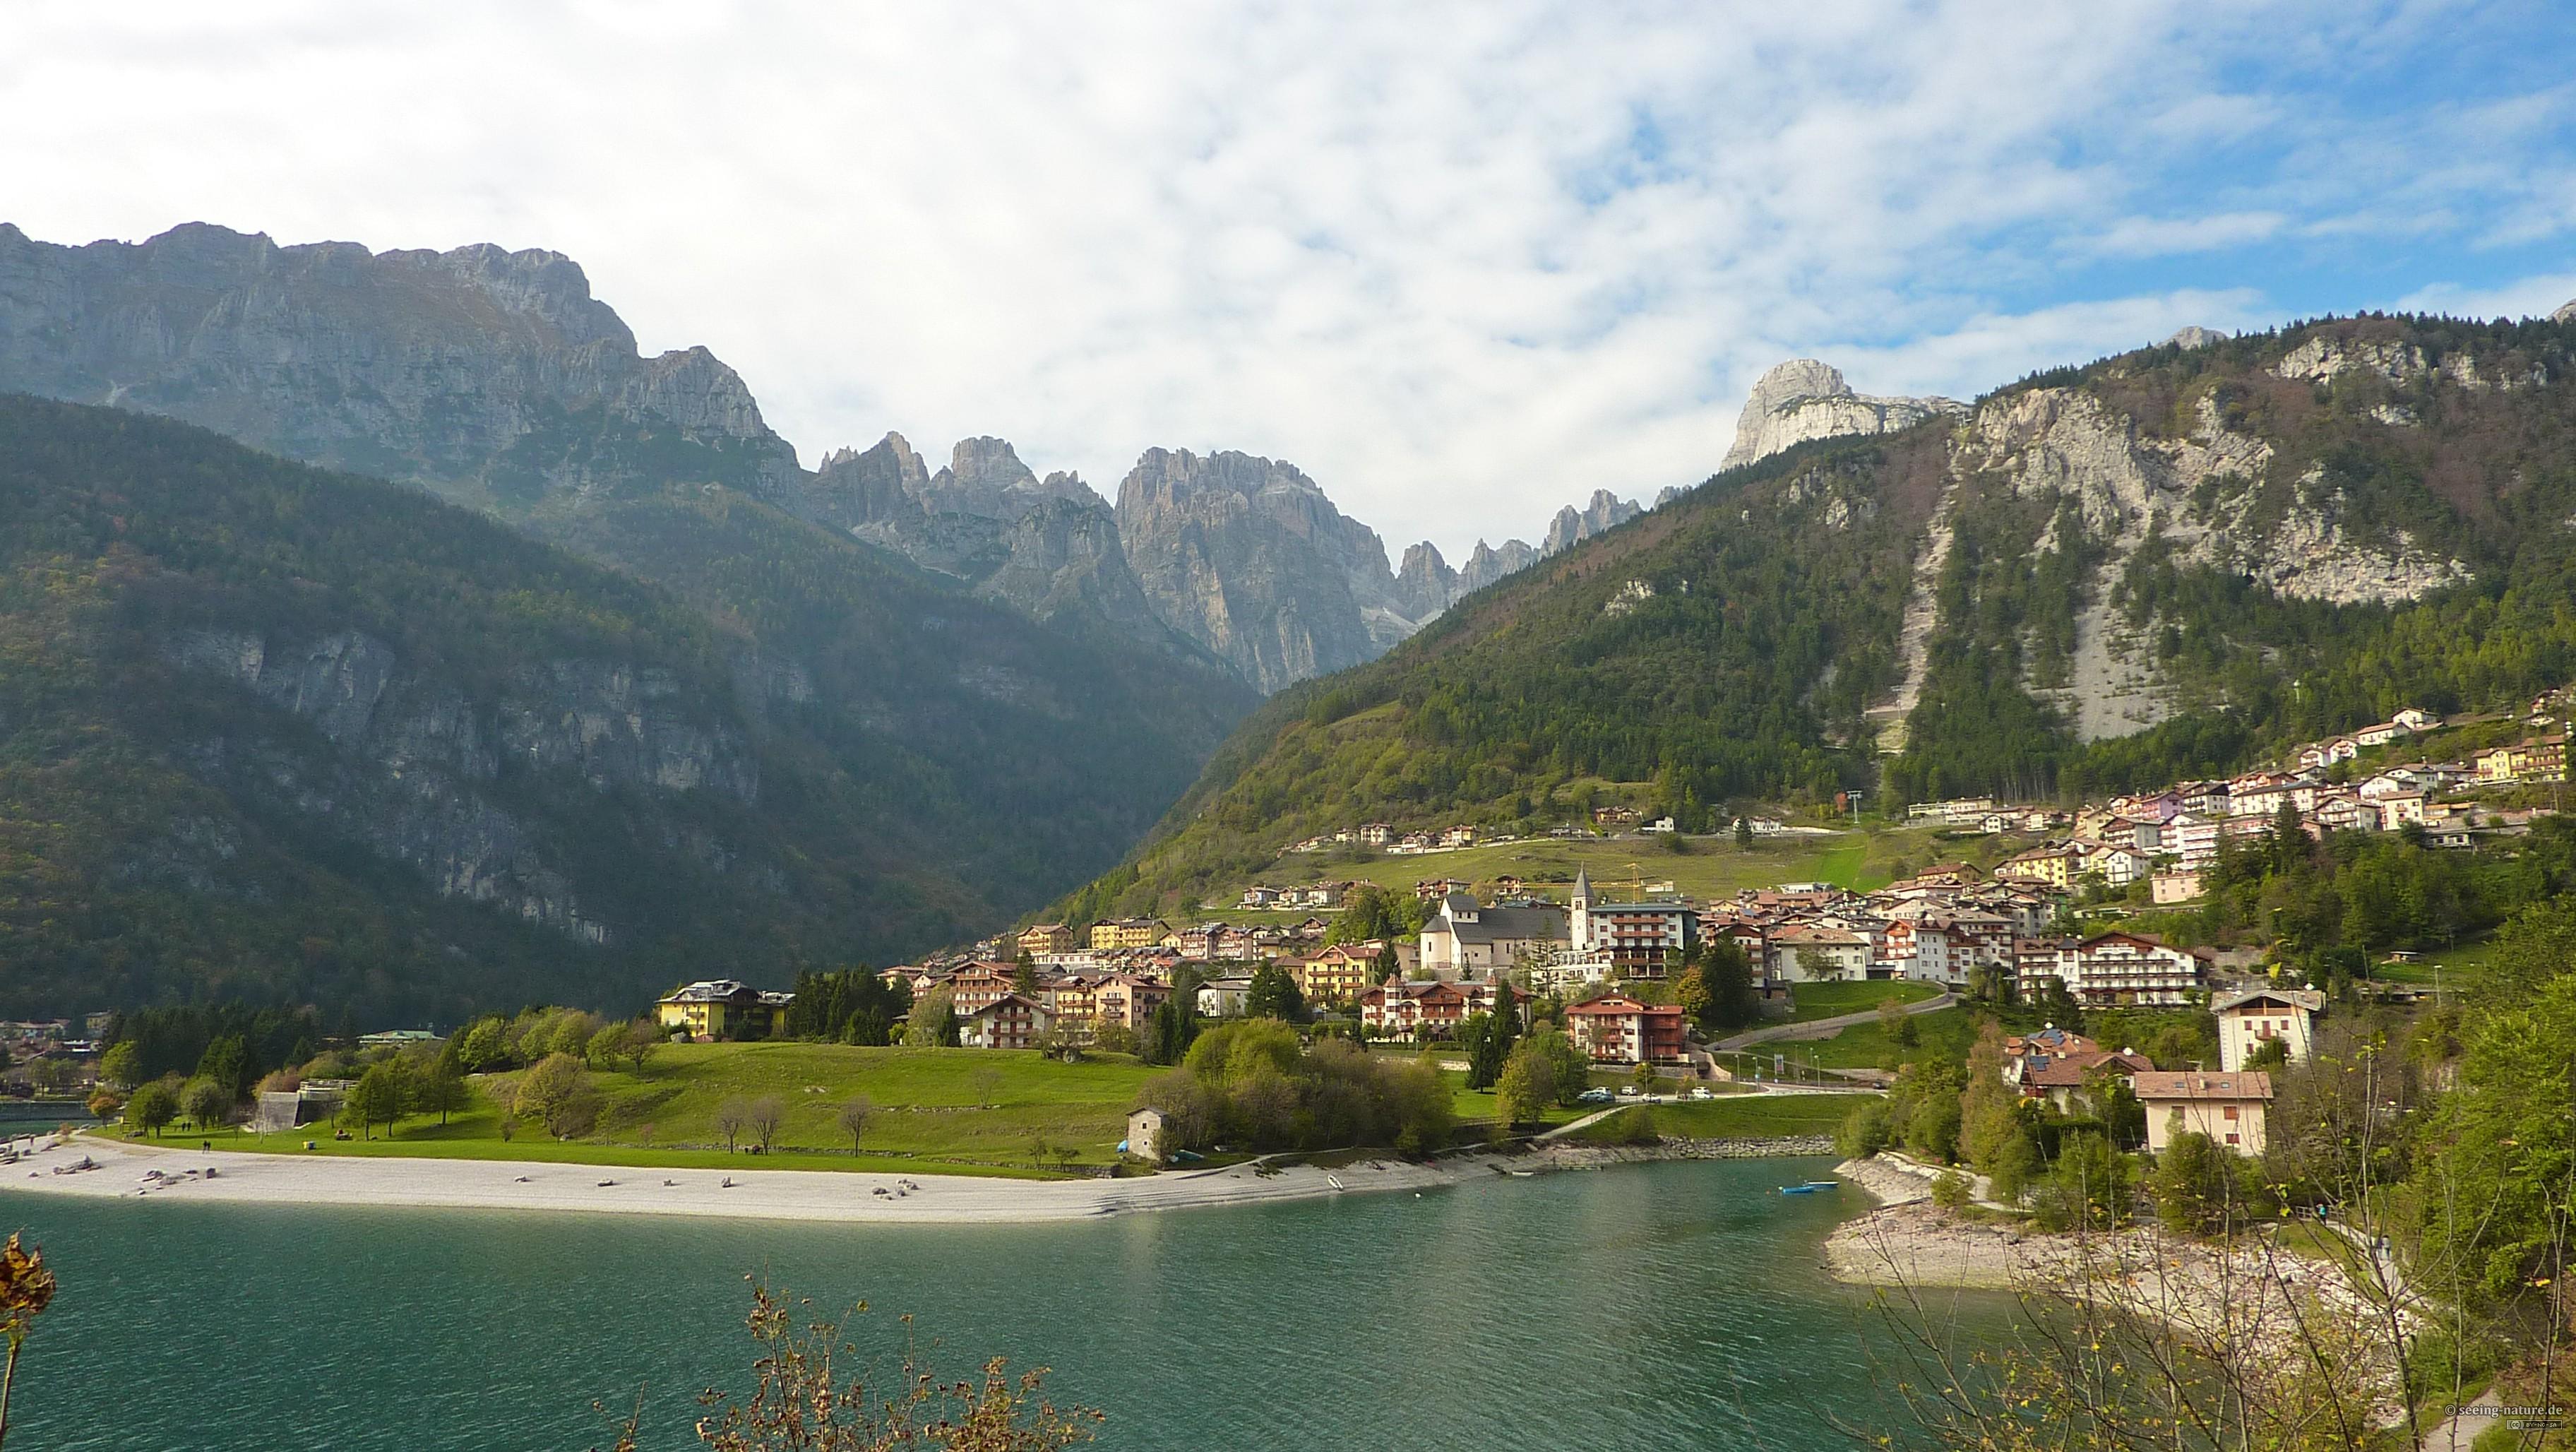 Postcard Village